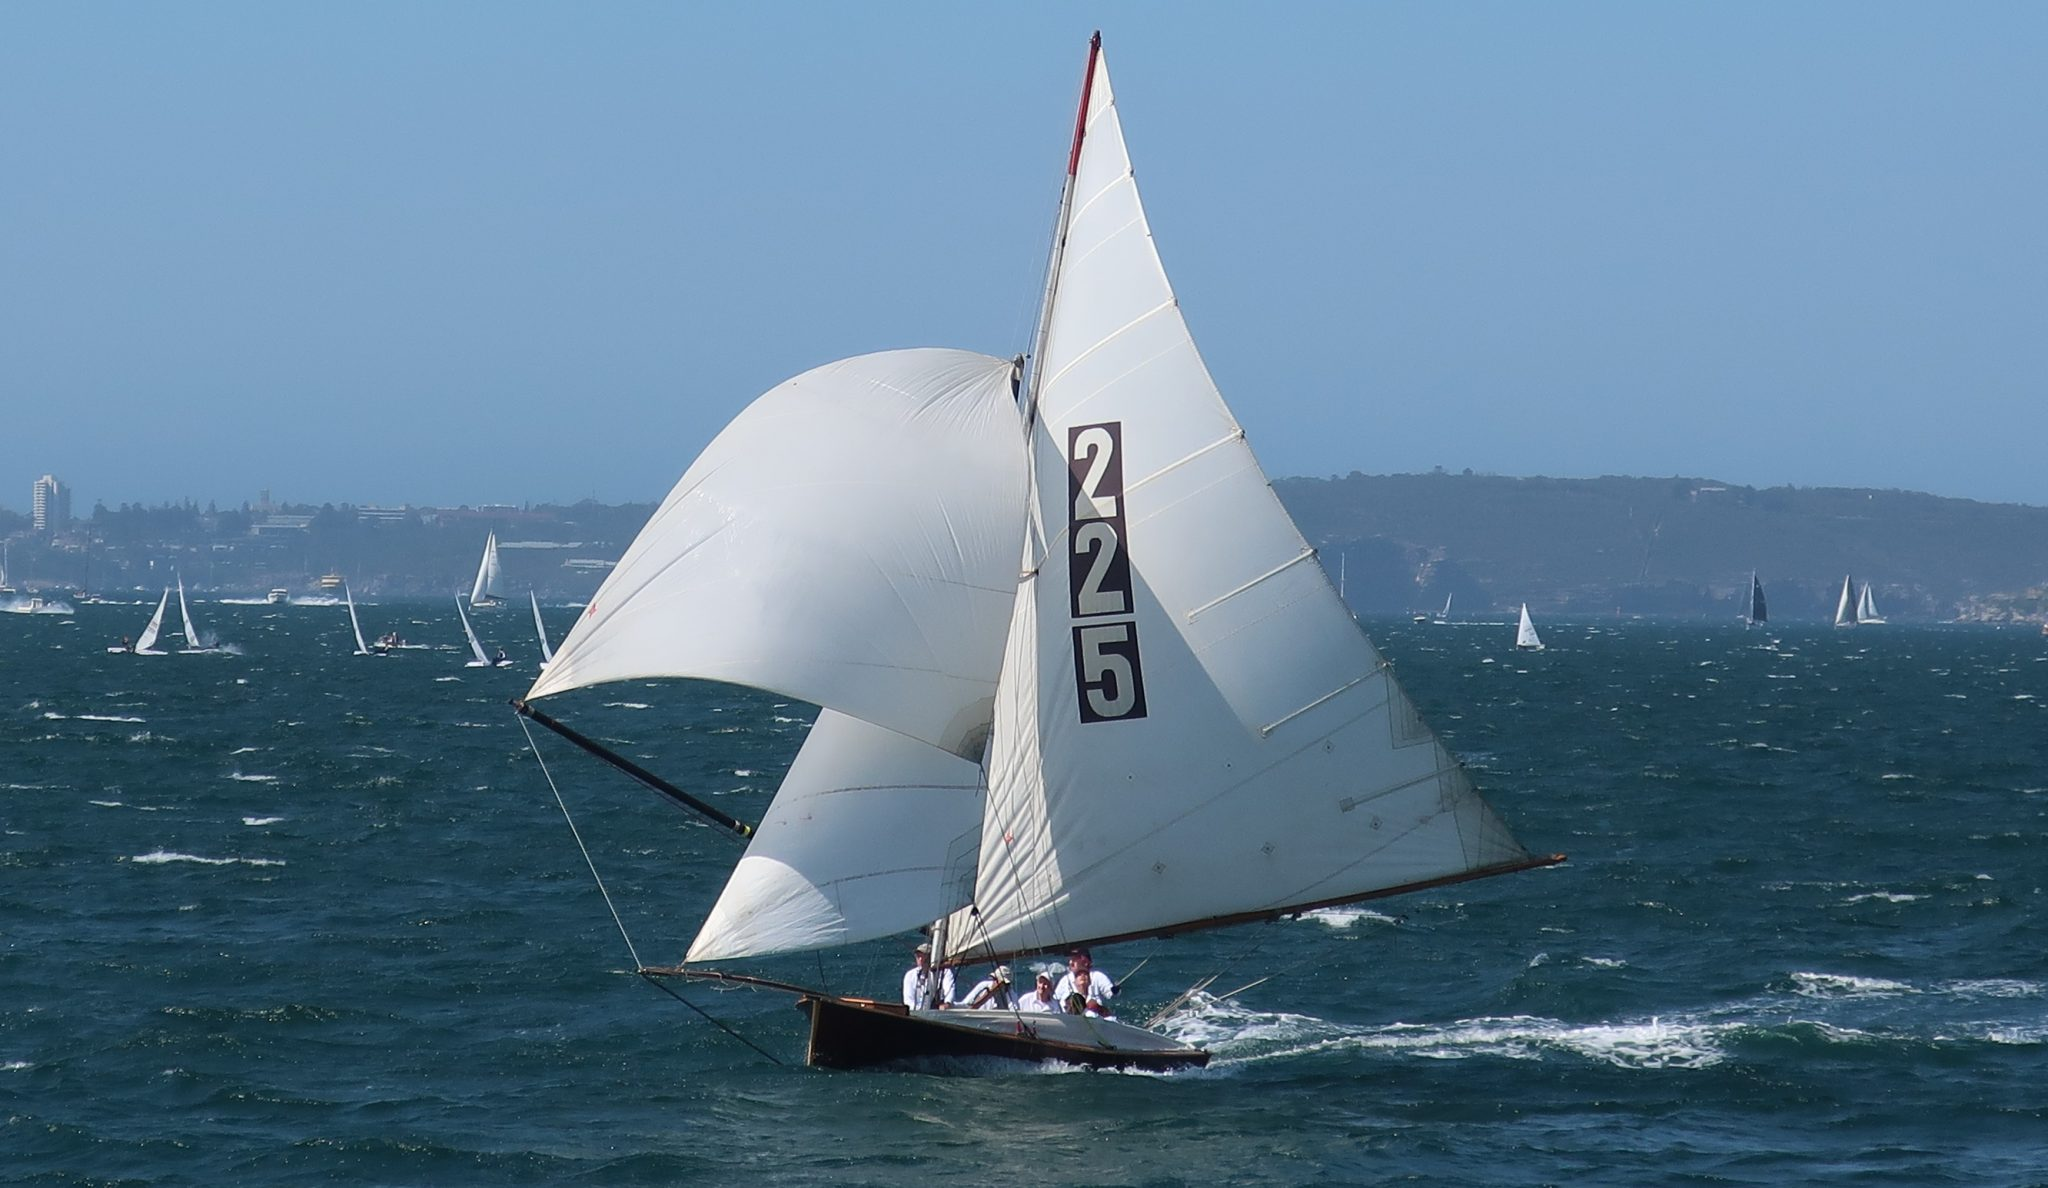 2020 Historical 18 Footer Australian Championship Race 3, The Mistake, small spinnaker on final run to finish off Clark Island